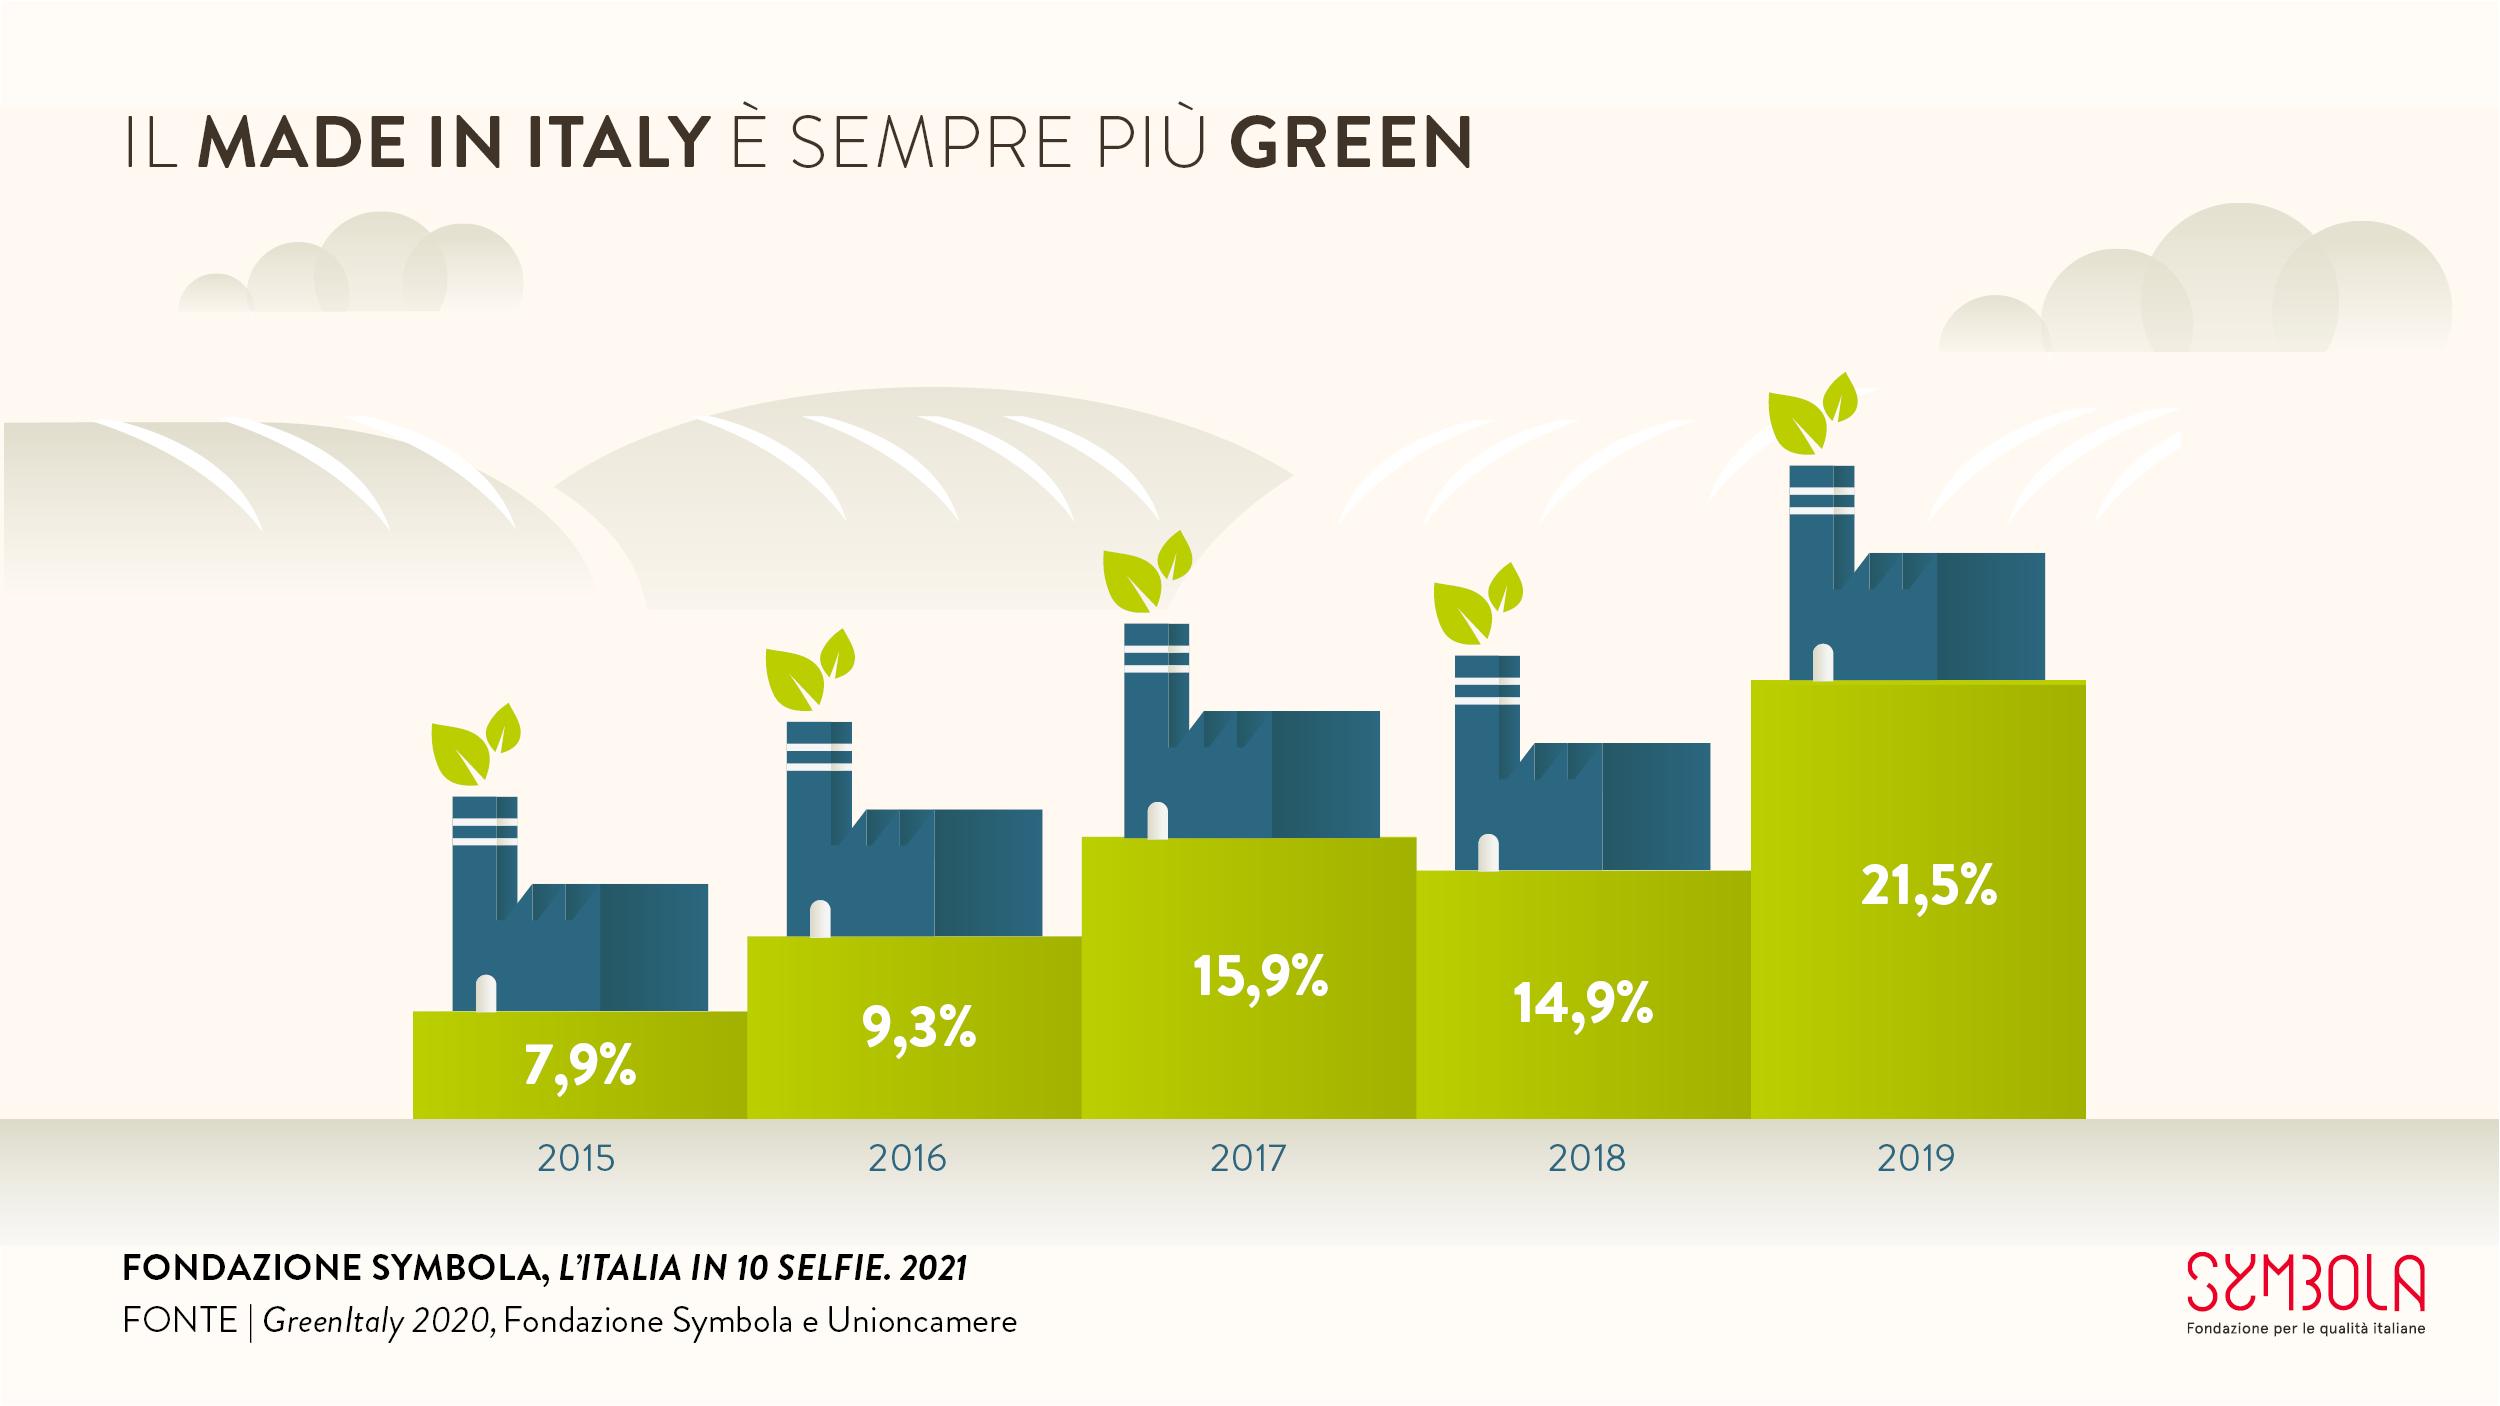 10 selfie 2021: Il made in Italy è sempre più green #3